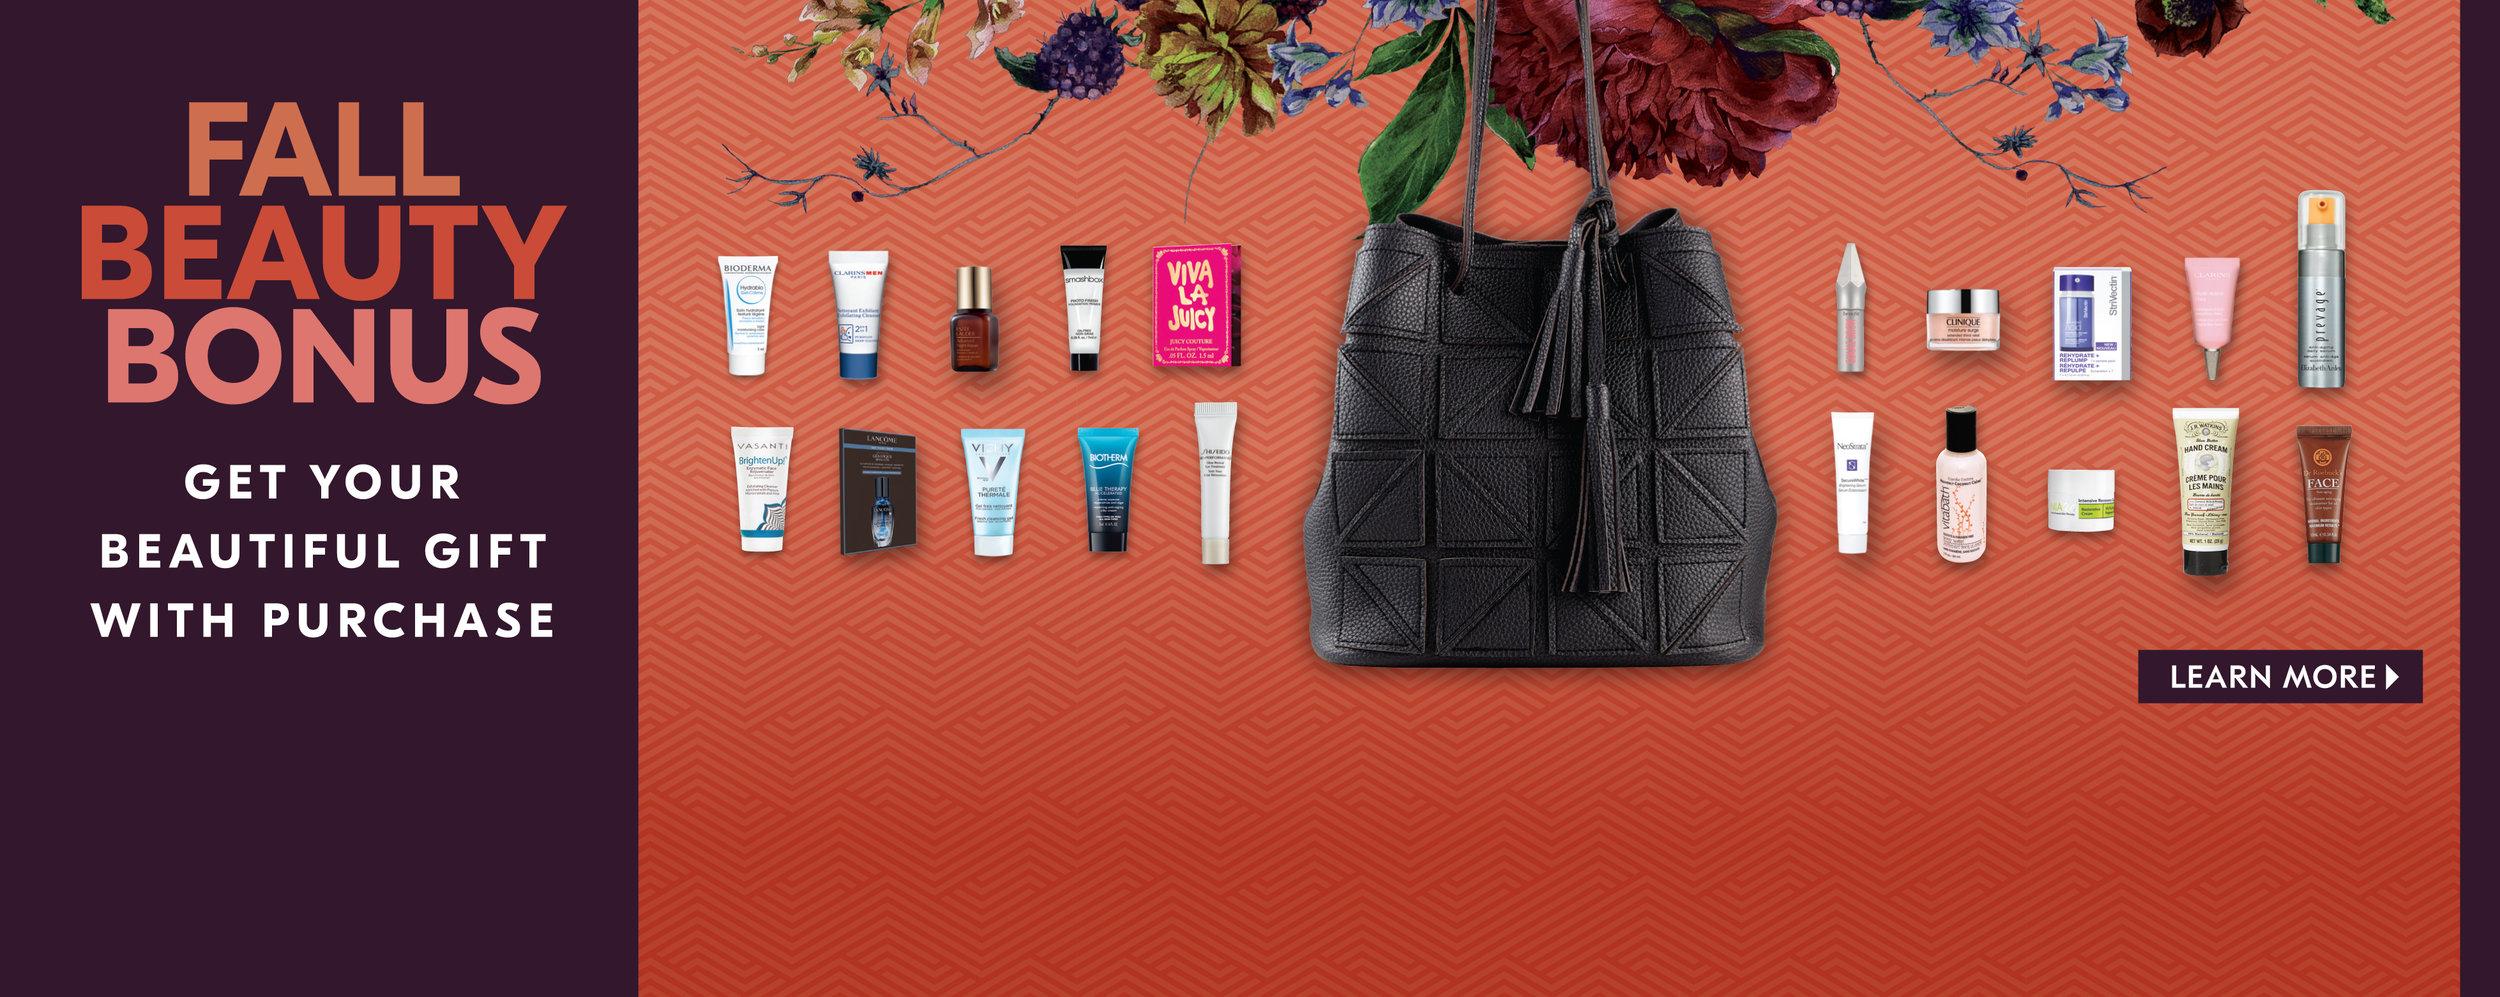 Shoppers Drug Mart Fall 2017 Fall Beauty Bonus Hero Slider 940px x 375px